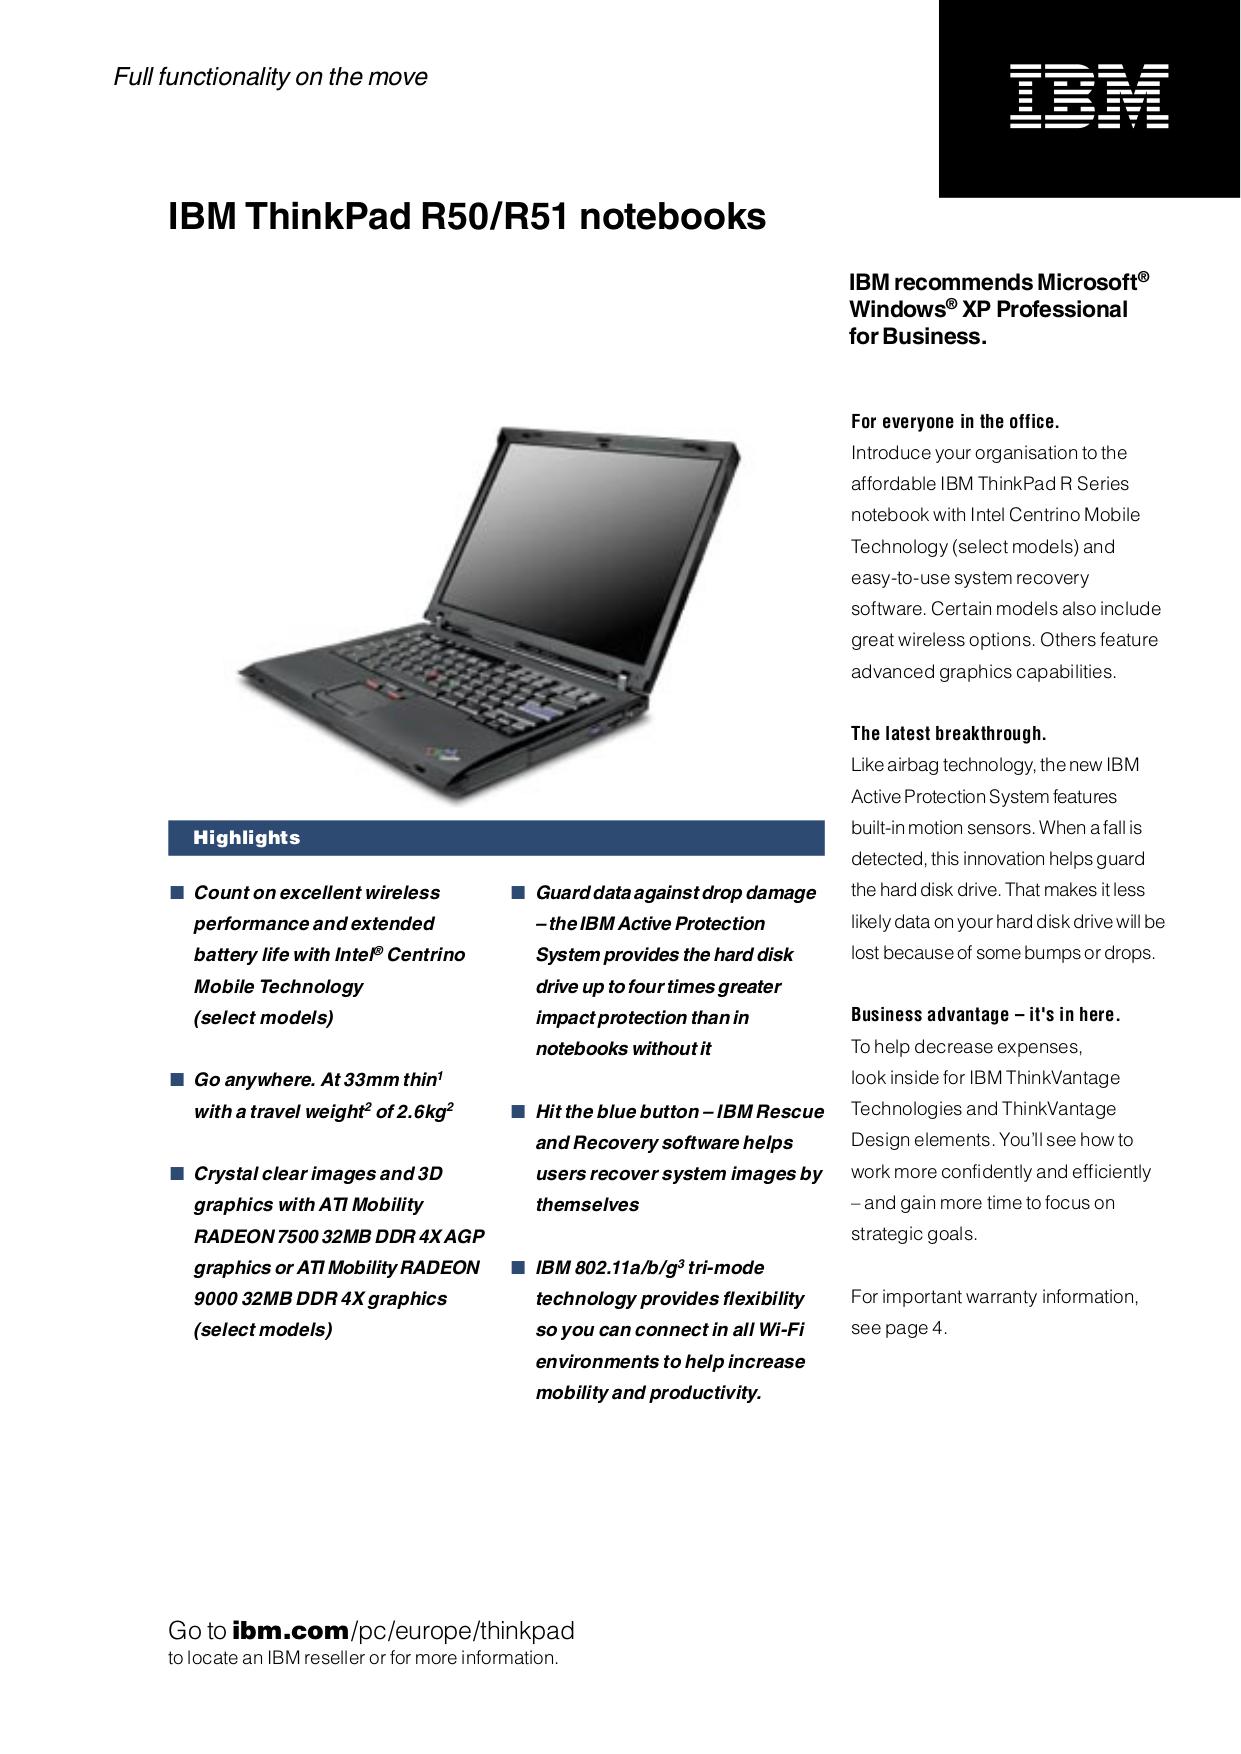 ibm r50 manual user guide manual that easy to read u2022 rh sibere co ibm mainframe ftp manual ibm mainframe manuals online